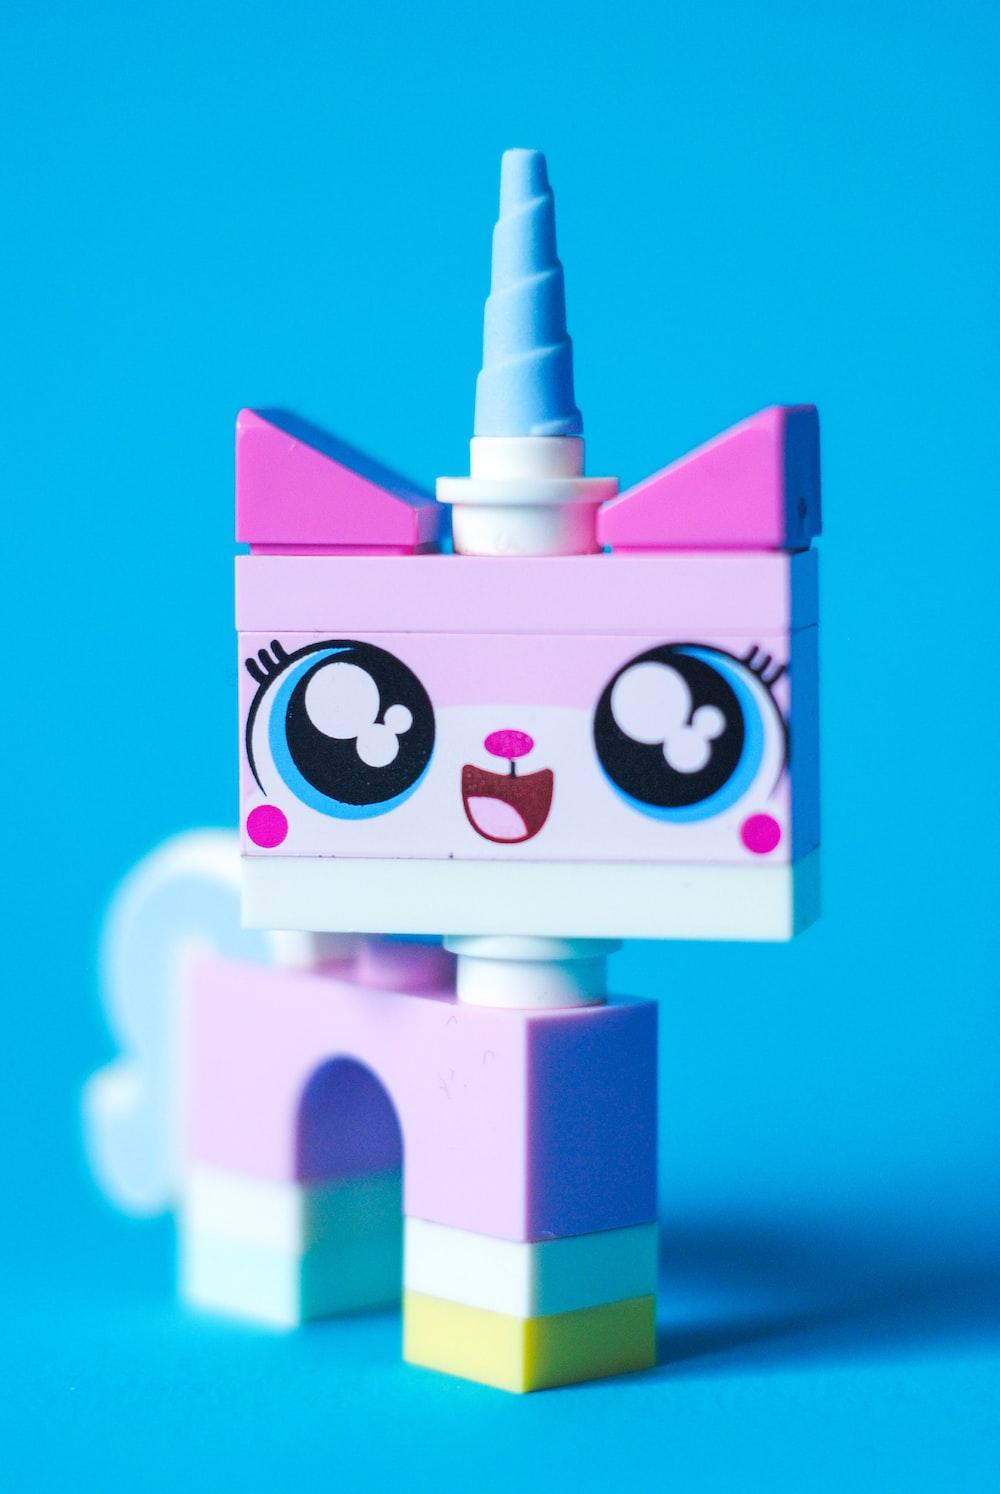 gambar unicron  54 378 unicorn stock photos pictures